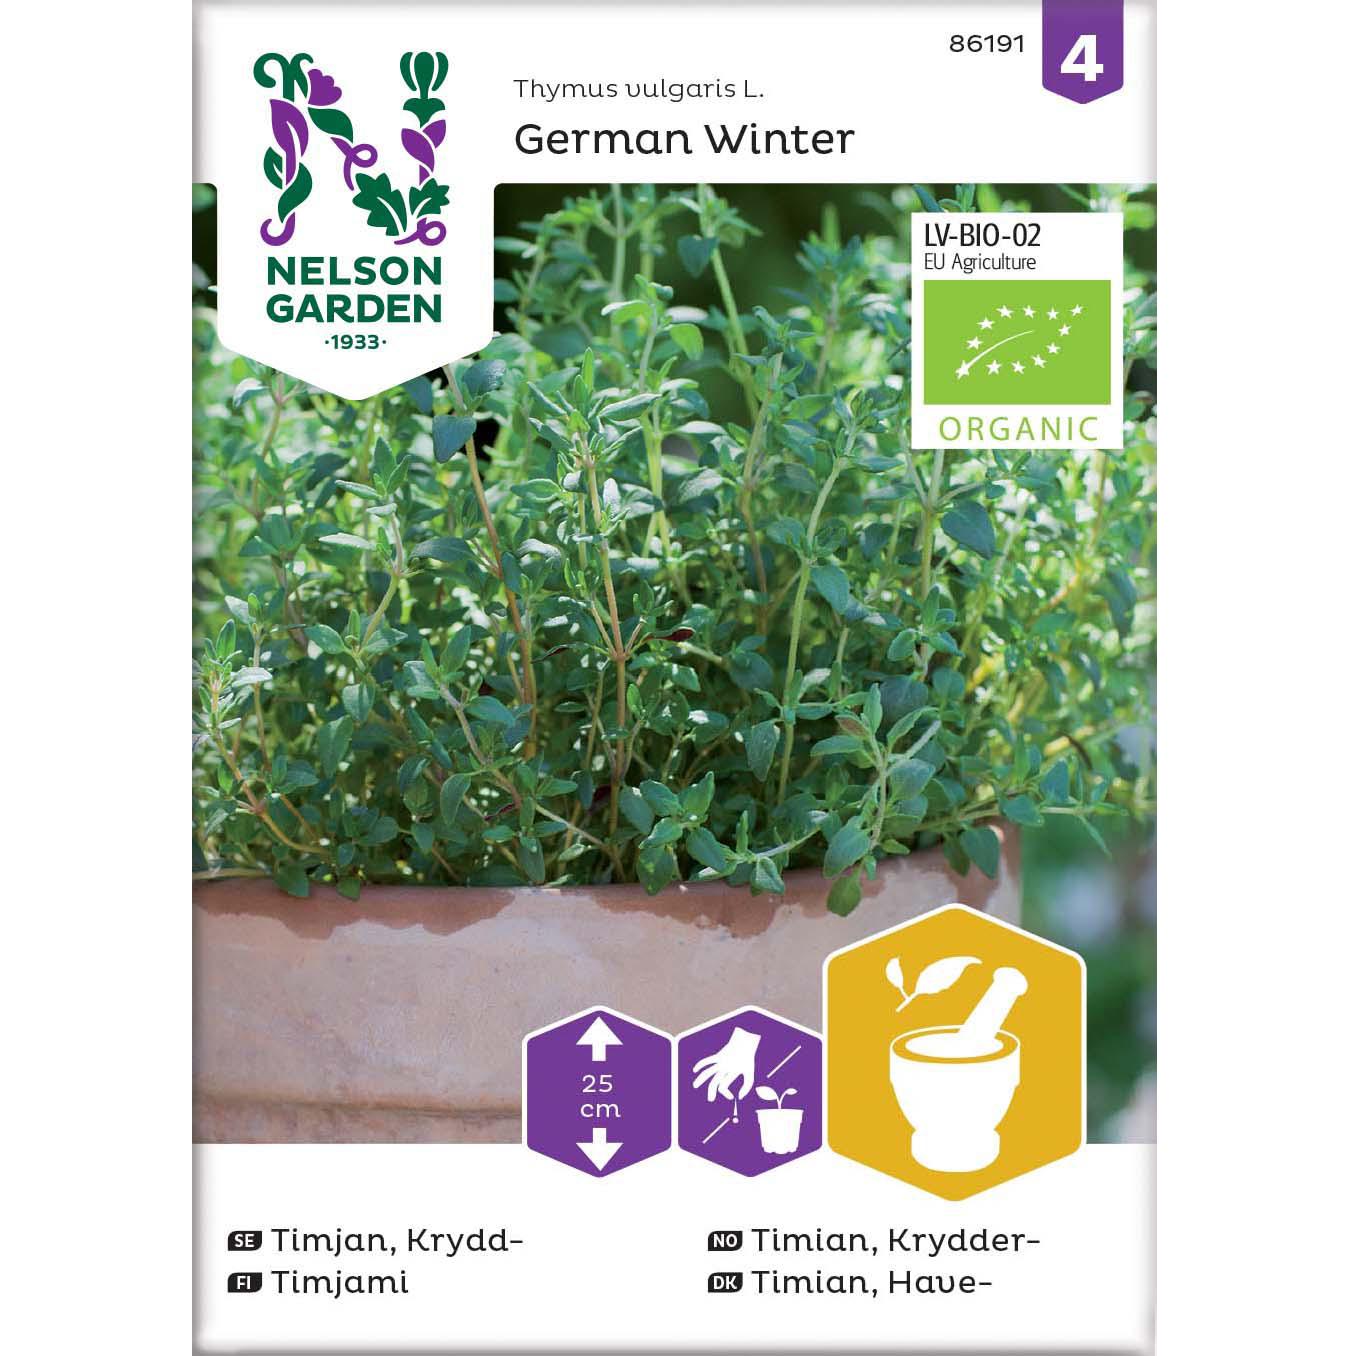 Timian, Have-, German Winter, Organic